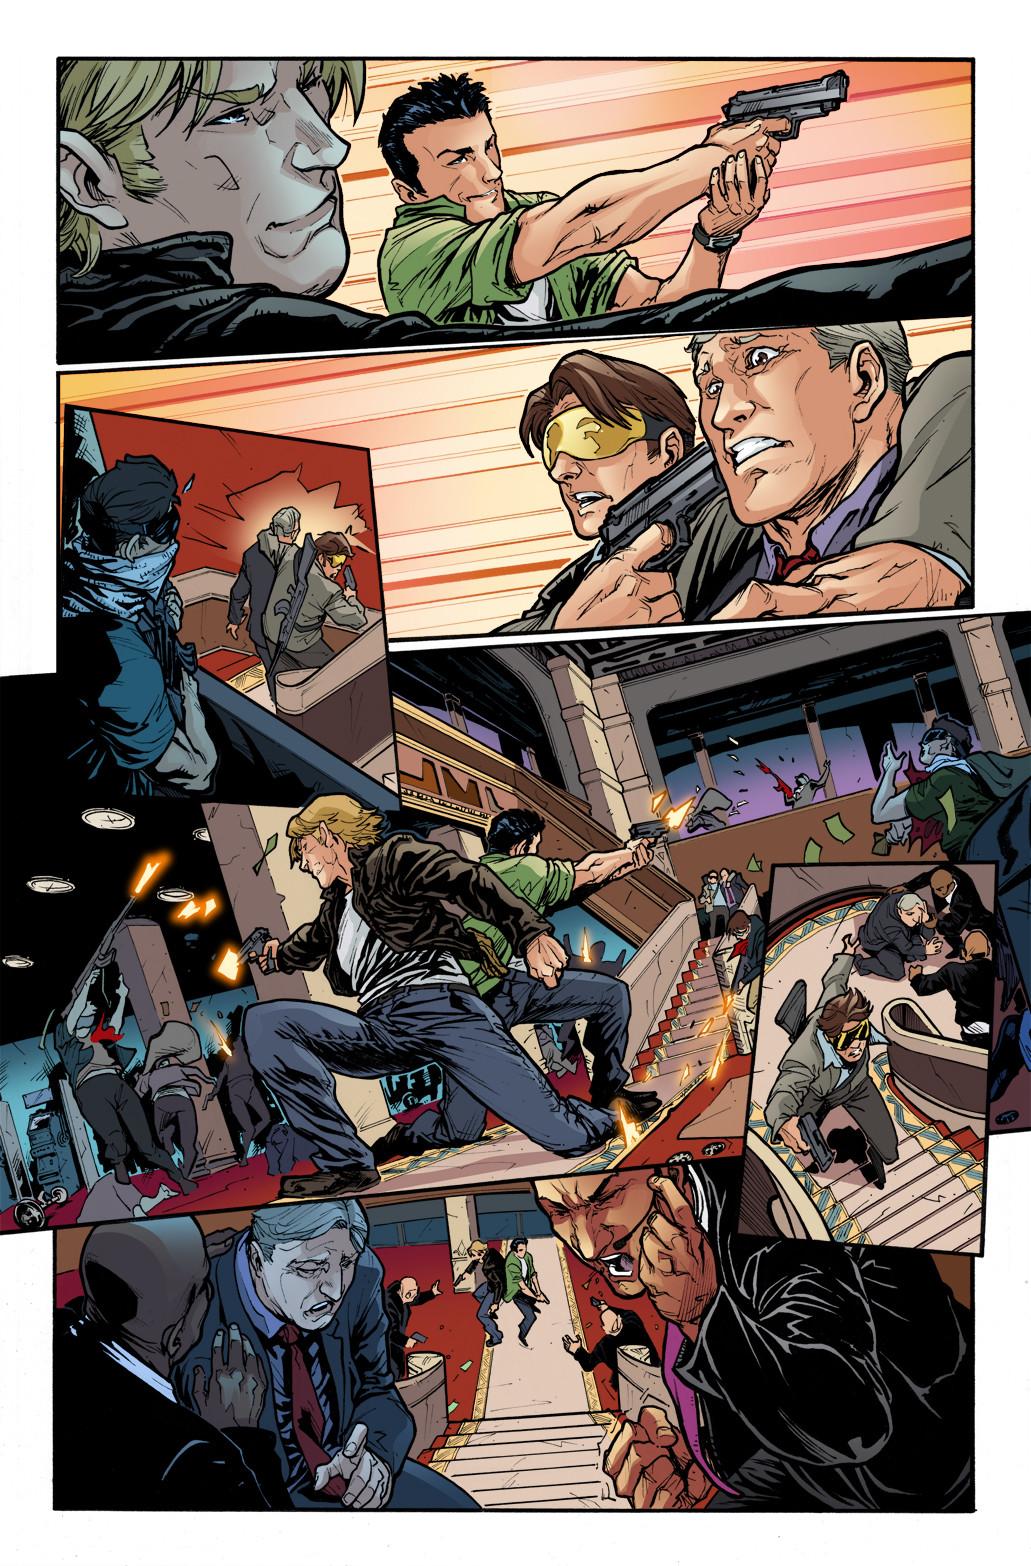 3 GUNS - #6, page 9